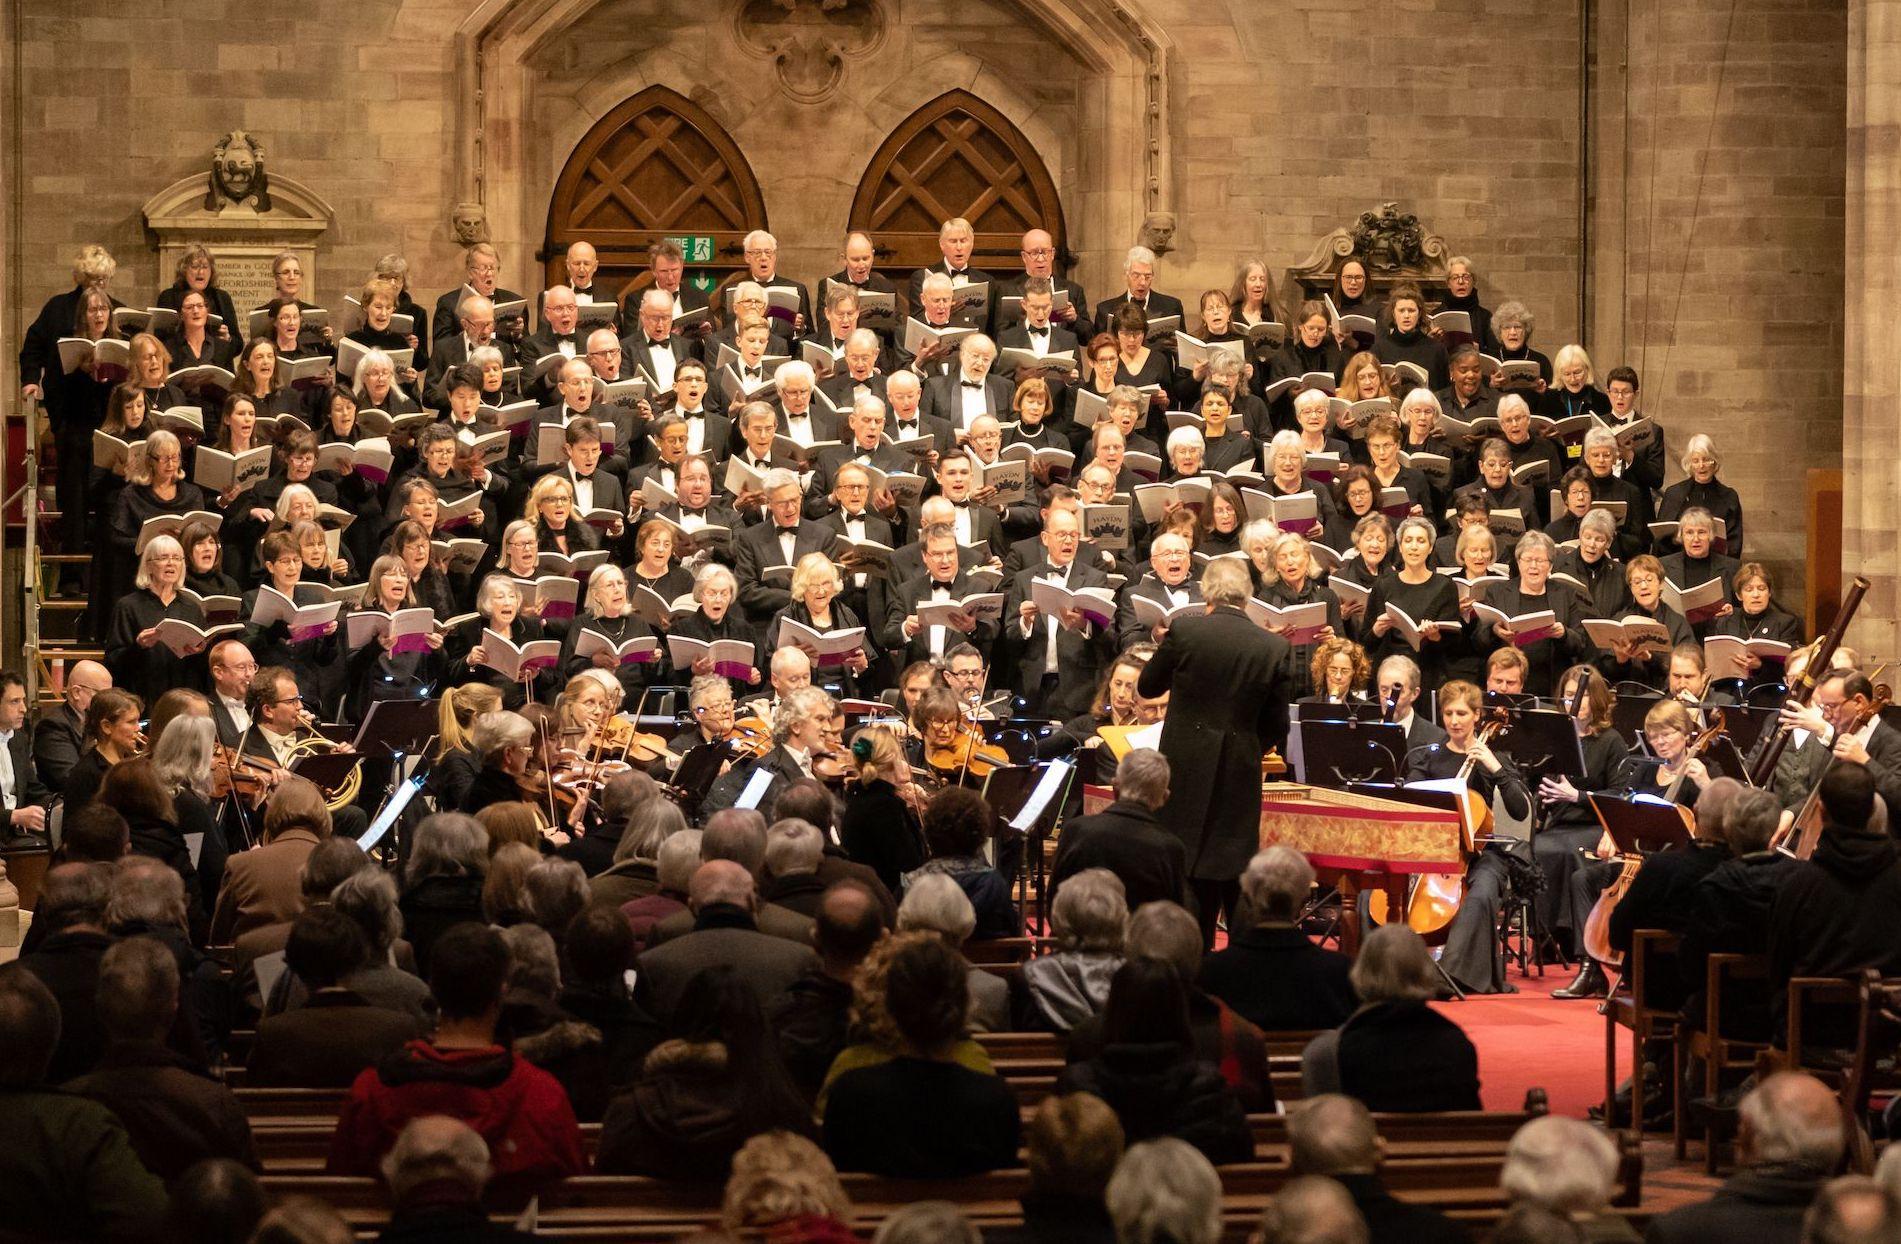 Mozart & Haydn Concert